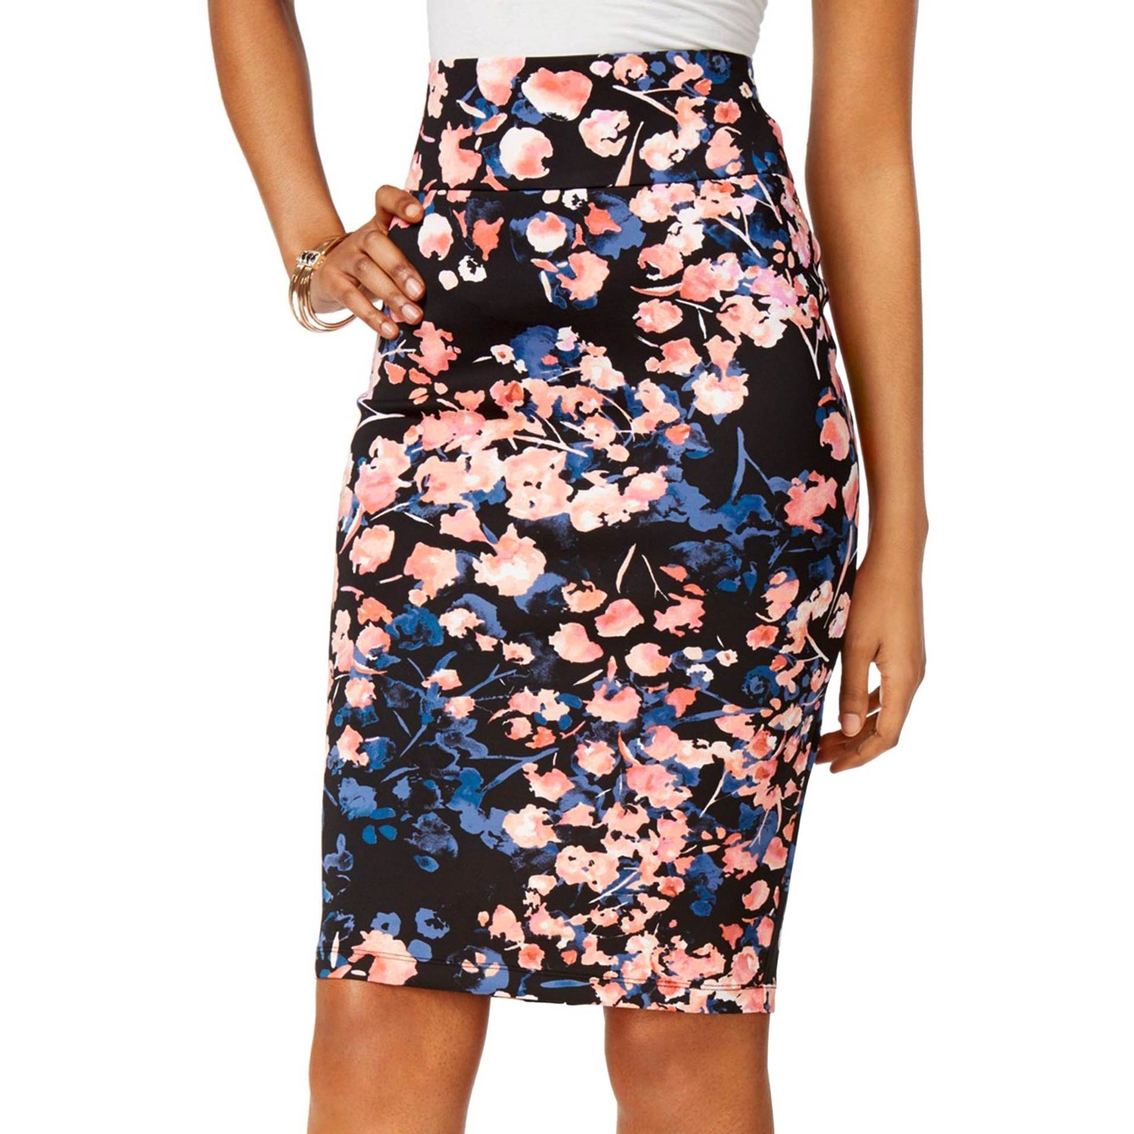 be1e27bab4 Thalia Sodi Printed Scuba Pencil Skirt | Skirts | Apparel | Shop The ...